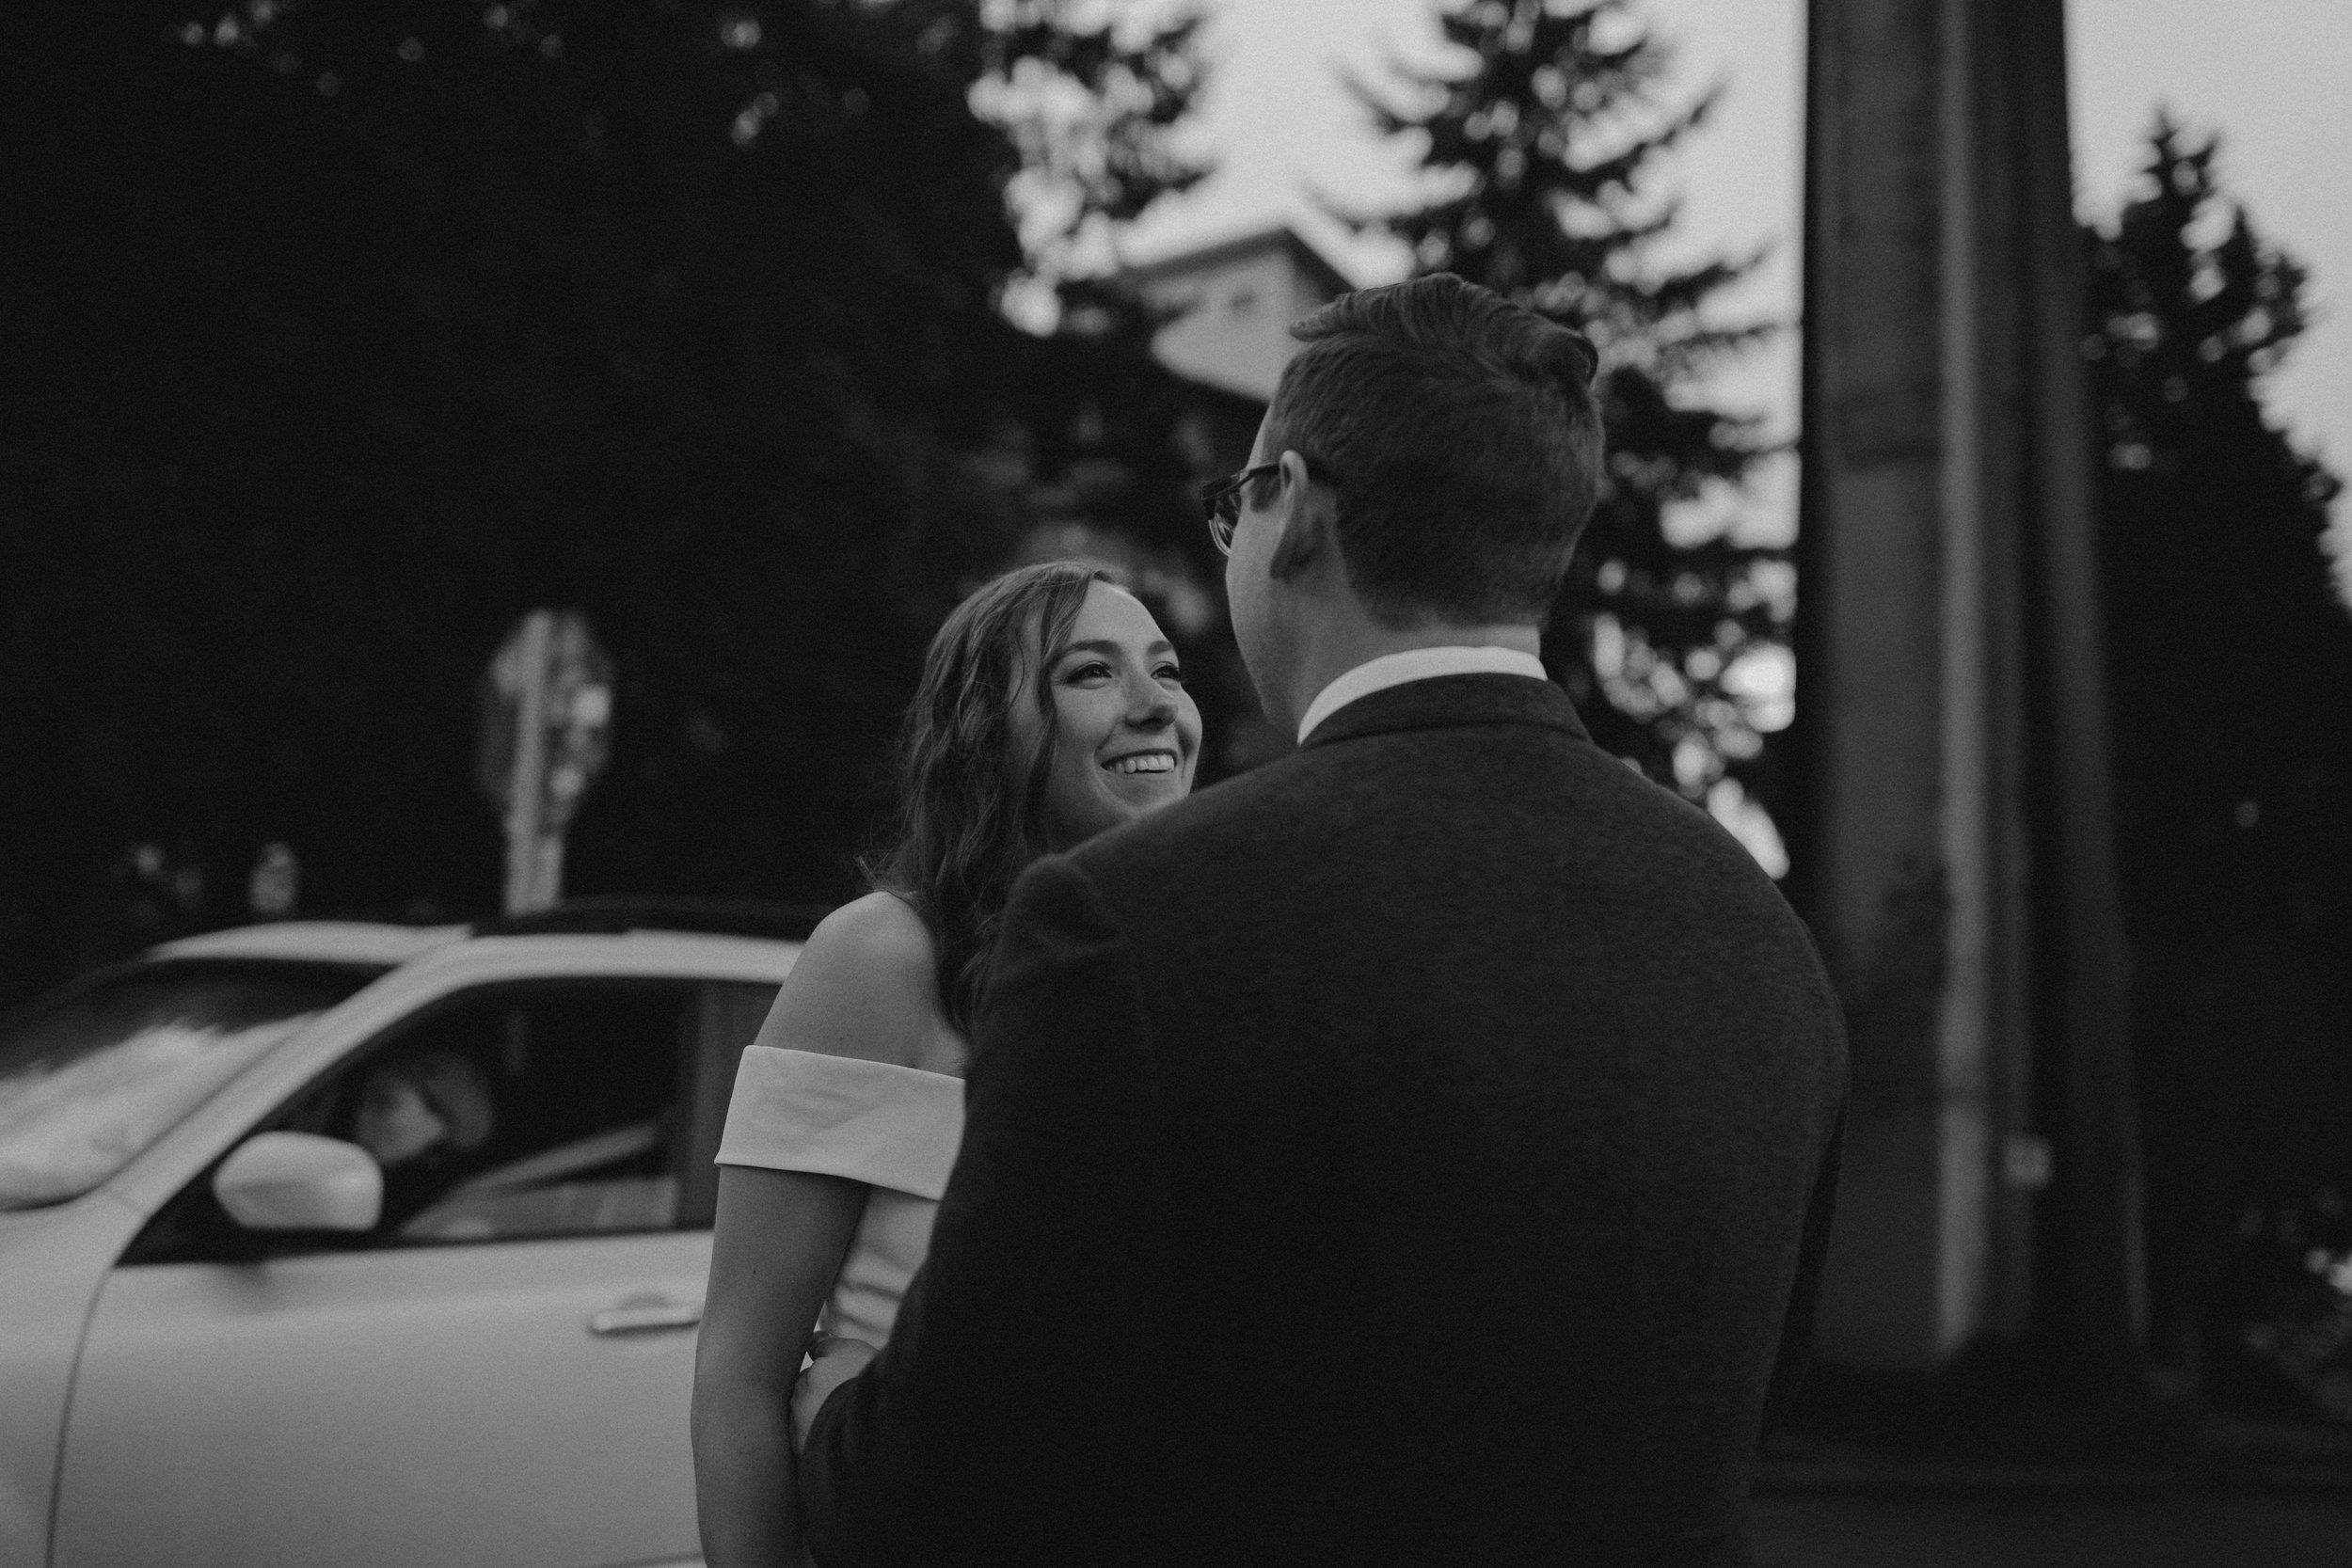 fremontfoundry_seattlewedding_oliviastrohmphotography-7.jpg